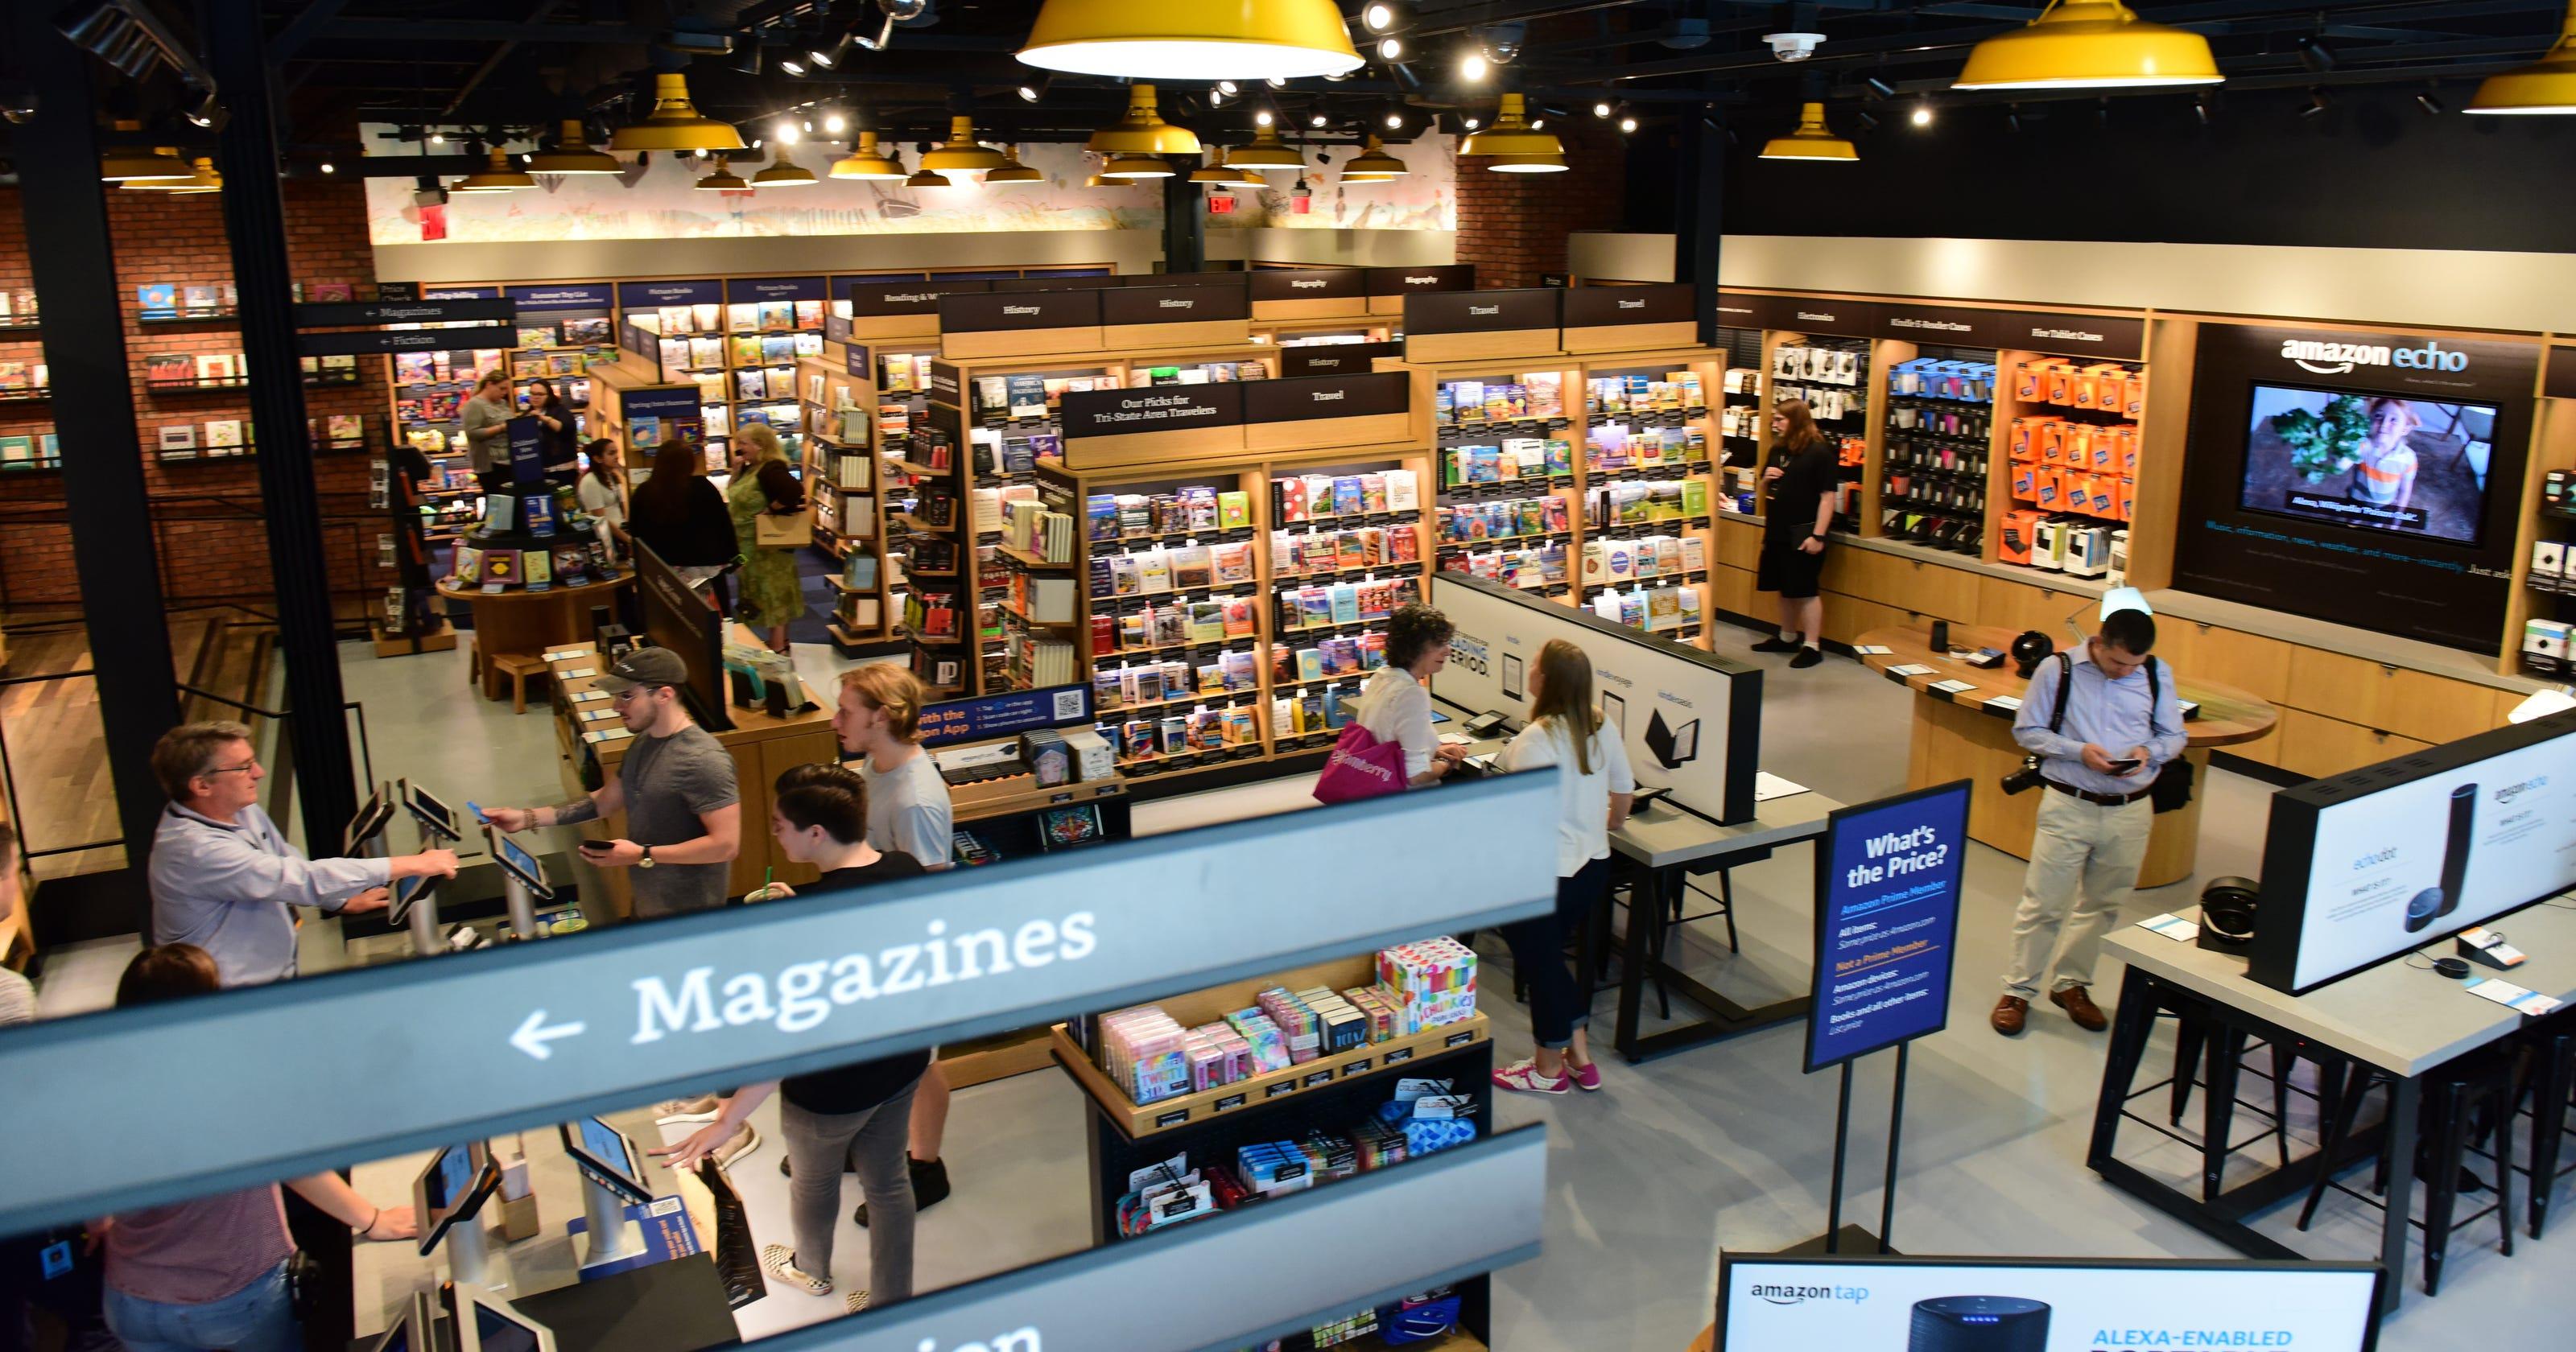 Amazon to end its pop-up kiosks program, includes 5 NJ locations